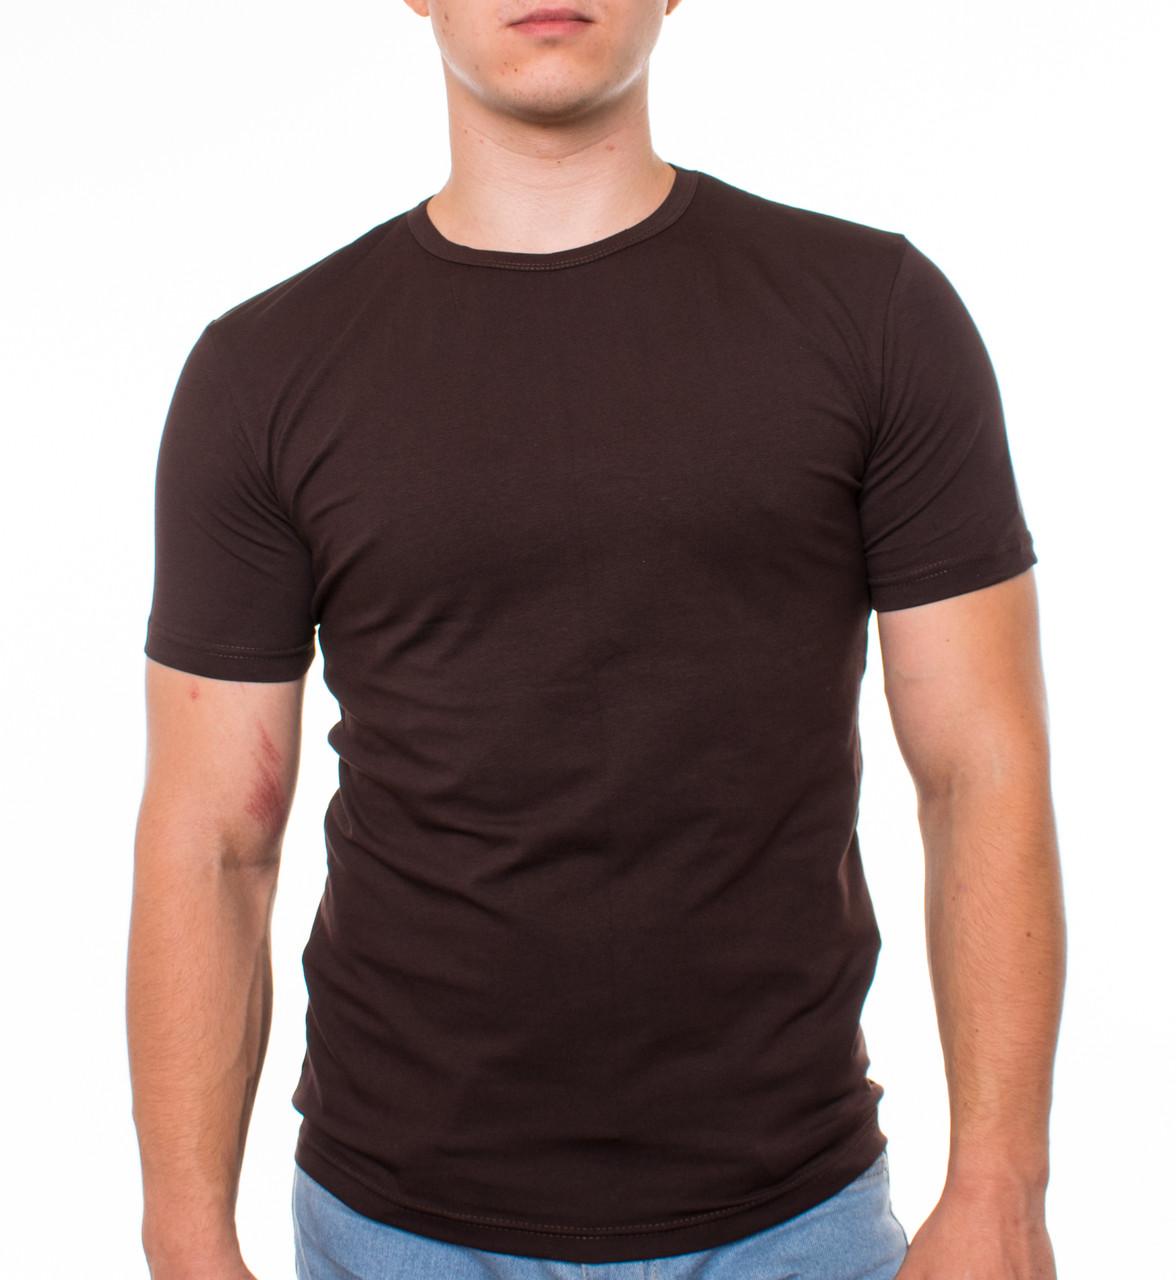 Bono Футболка Мужская коричневая 950199